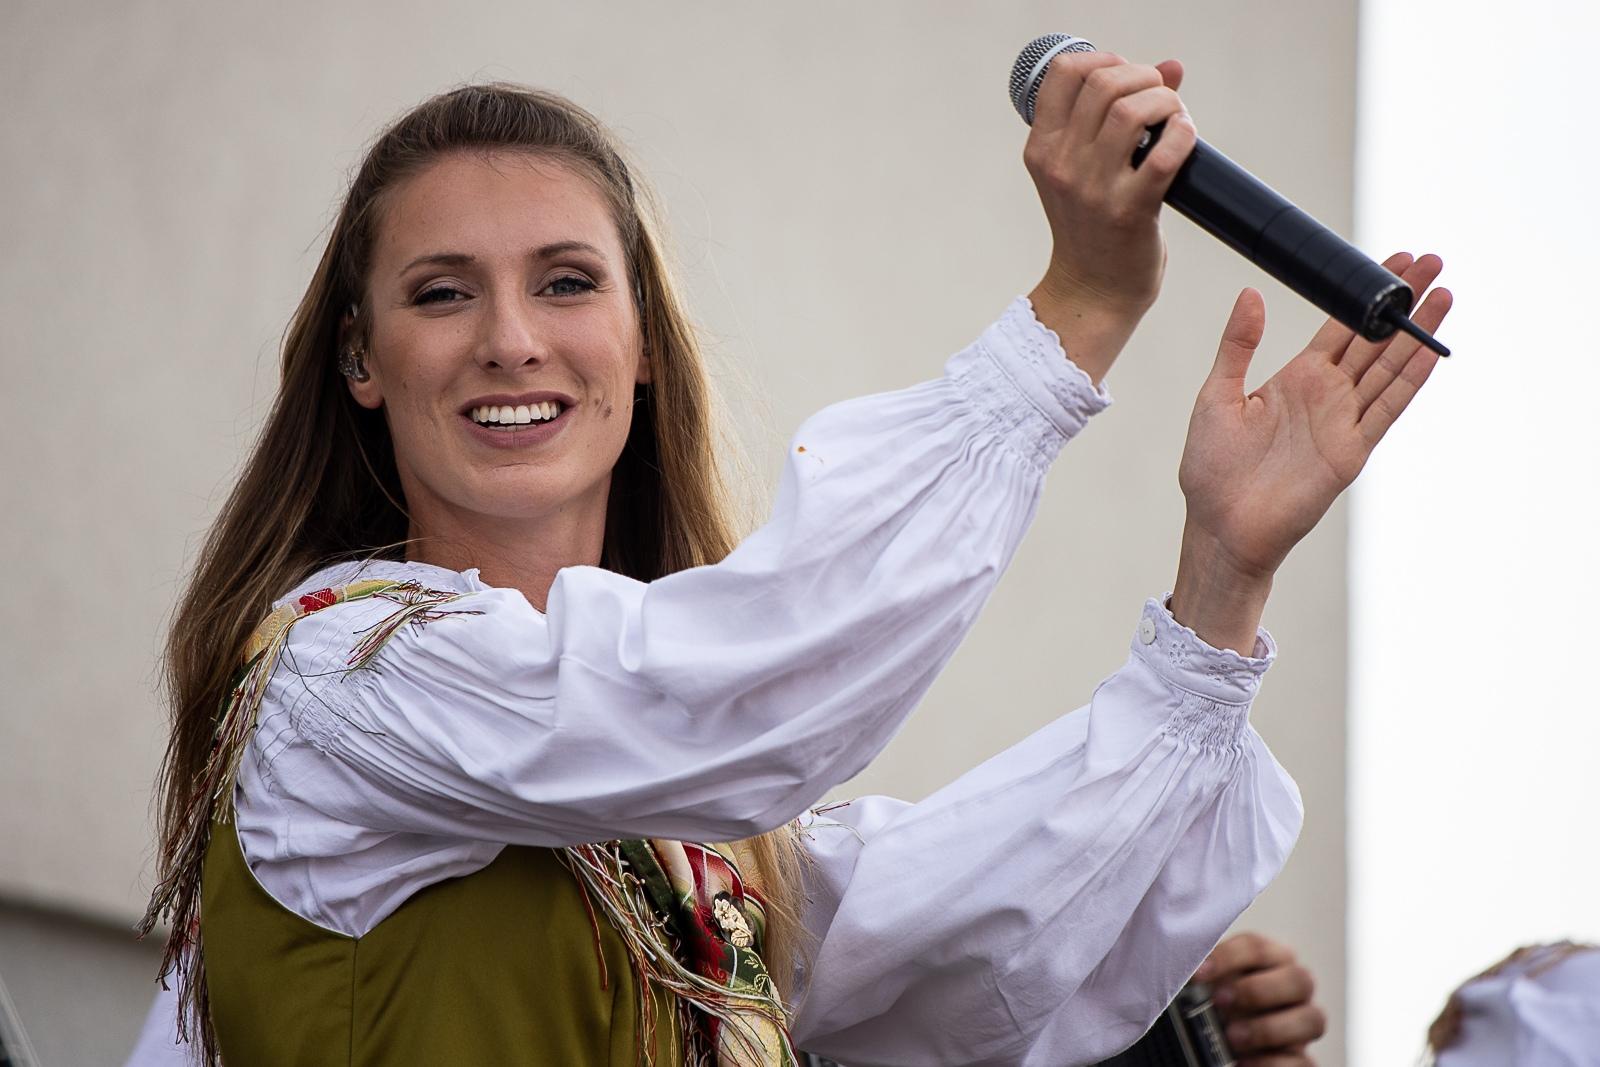 Sašo Avsenik band performed at the opening of the wine fountain